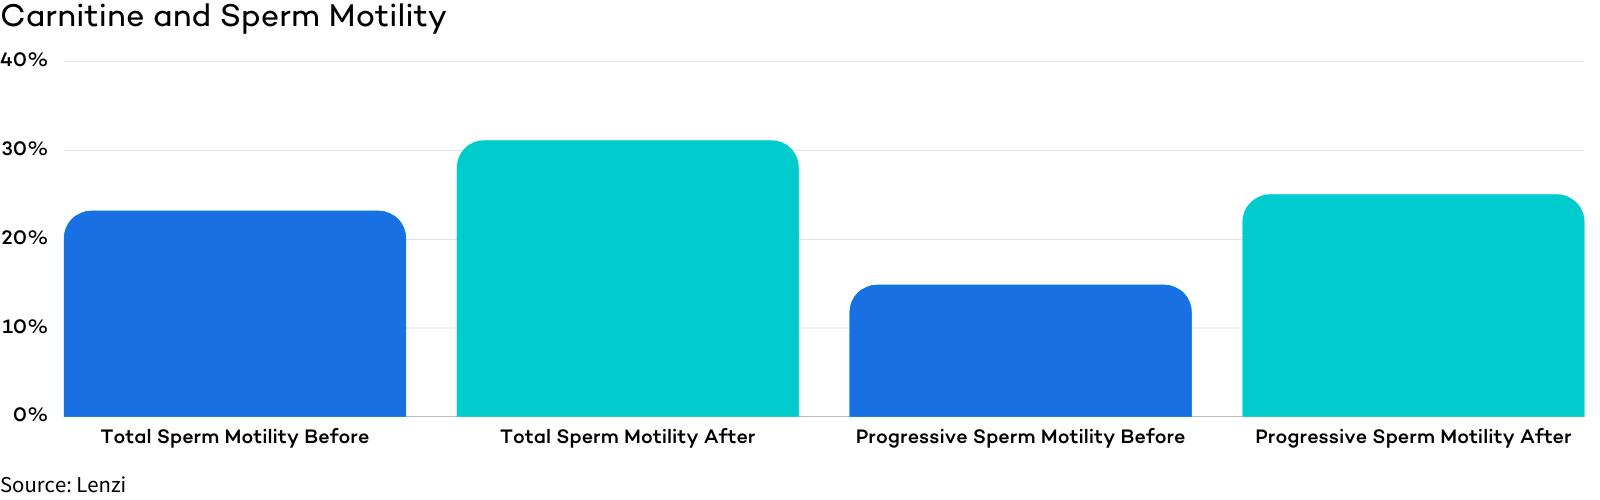 Carnitine - A Top Male Fertility Vitamin for Sperm Motility